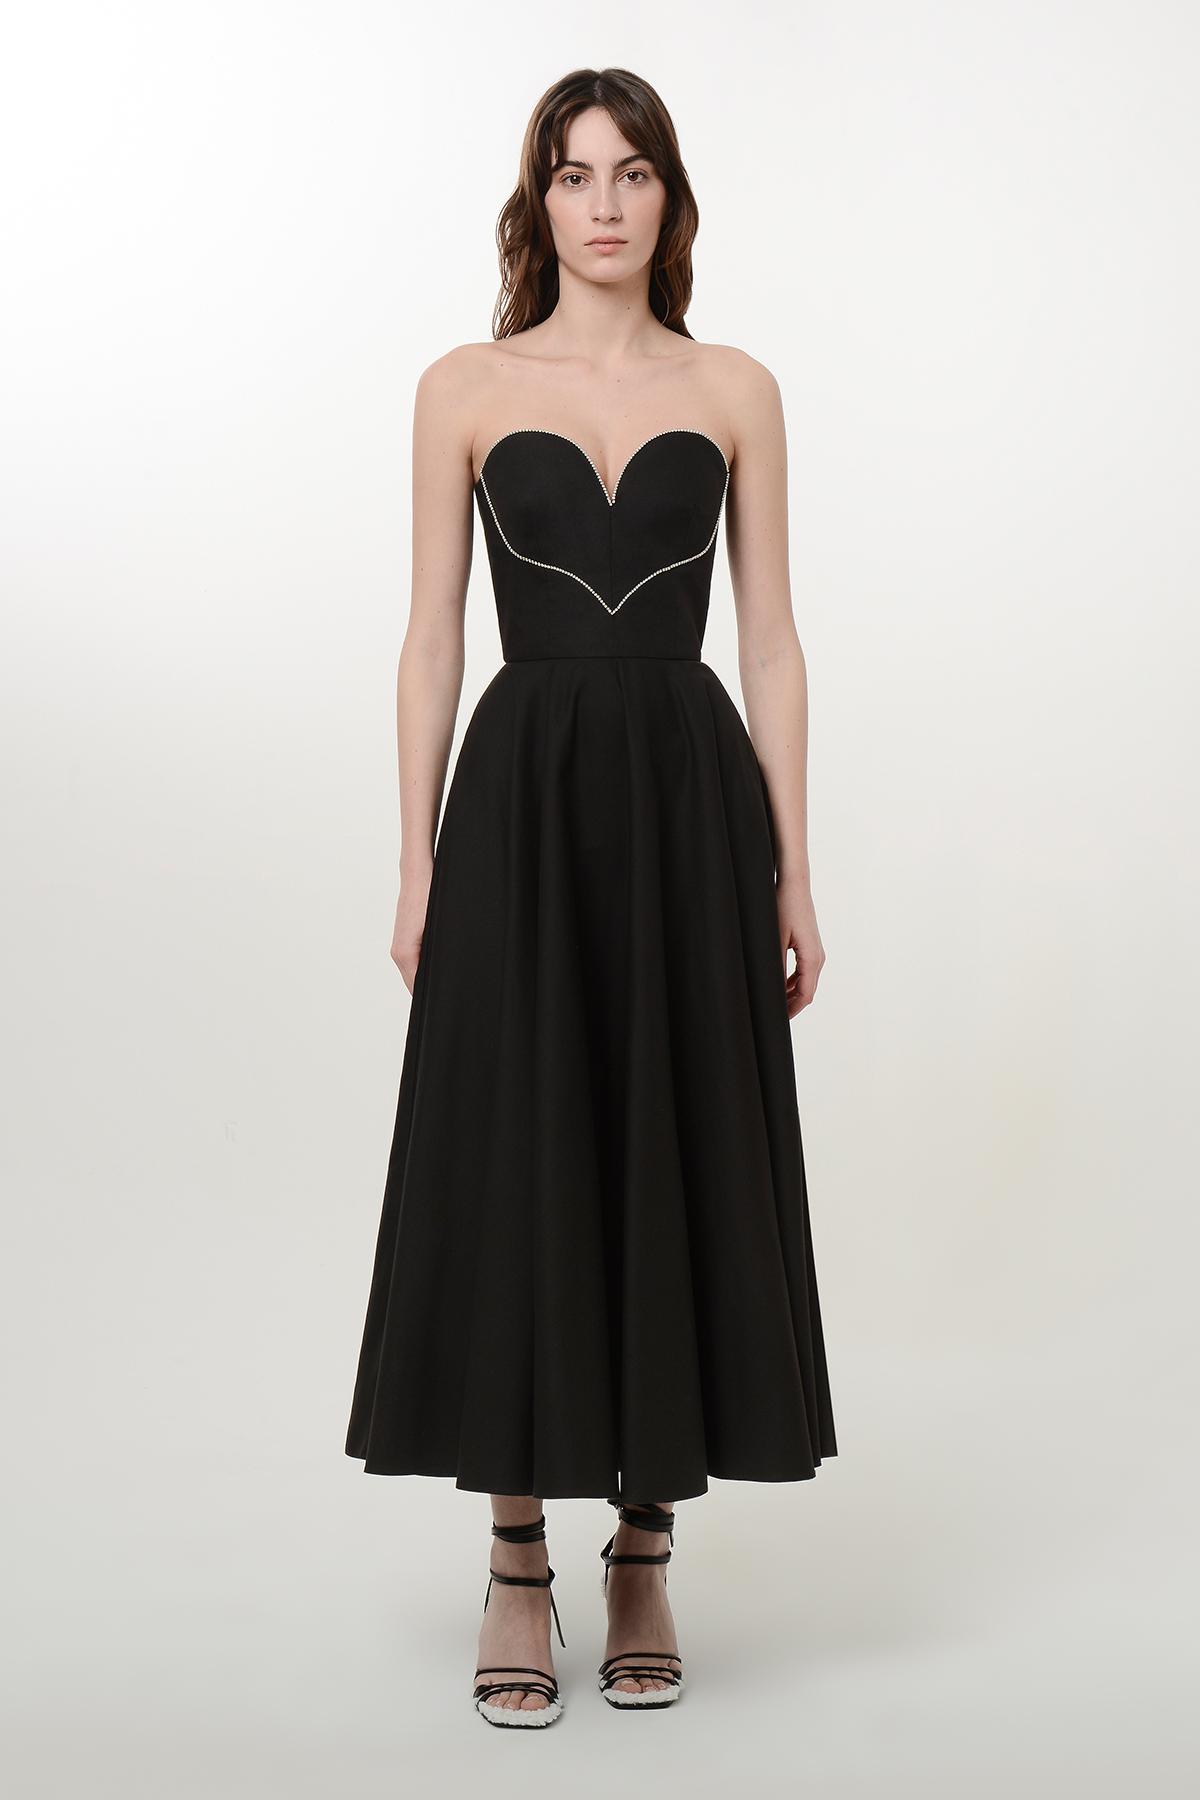 Corset style flare heart dress